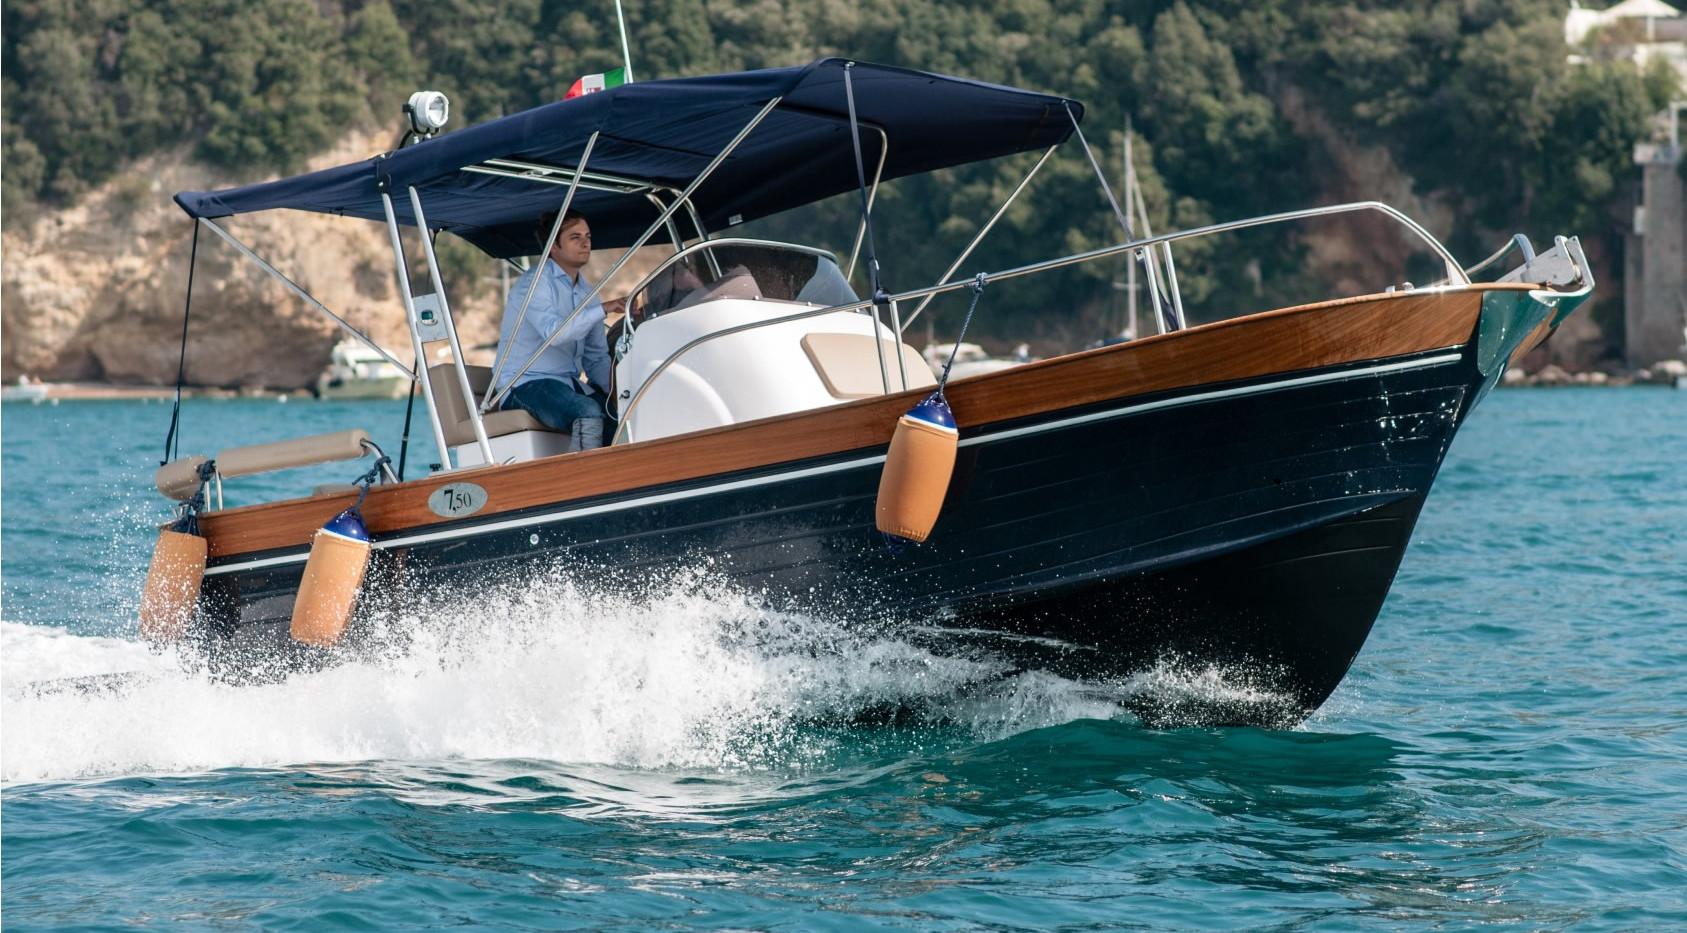 Sangiorgio boat